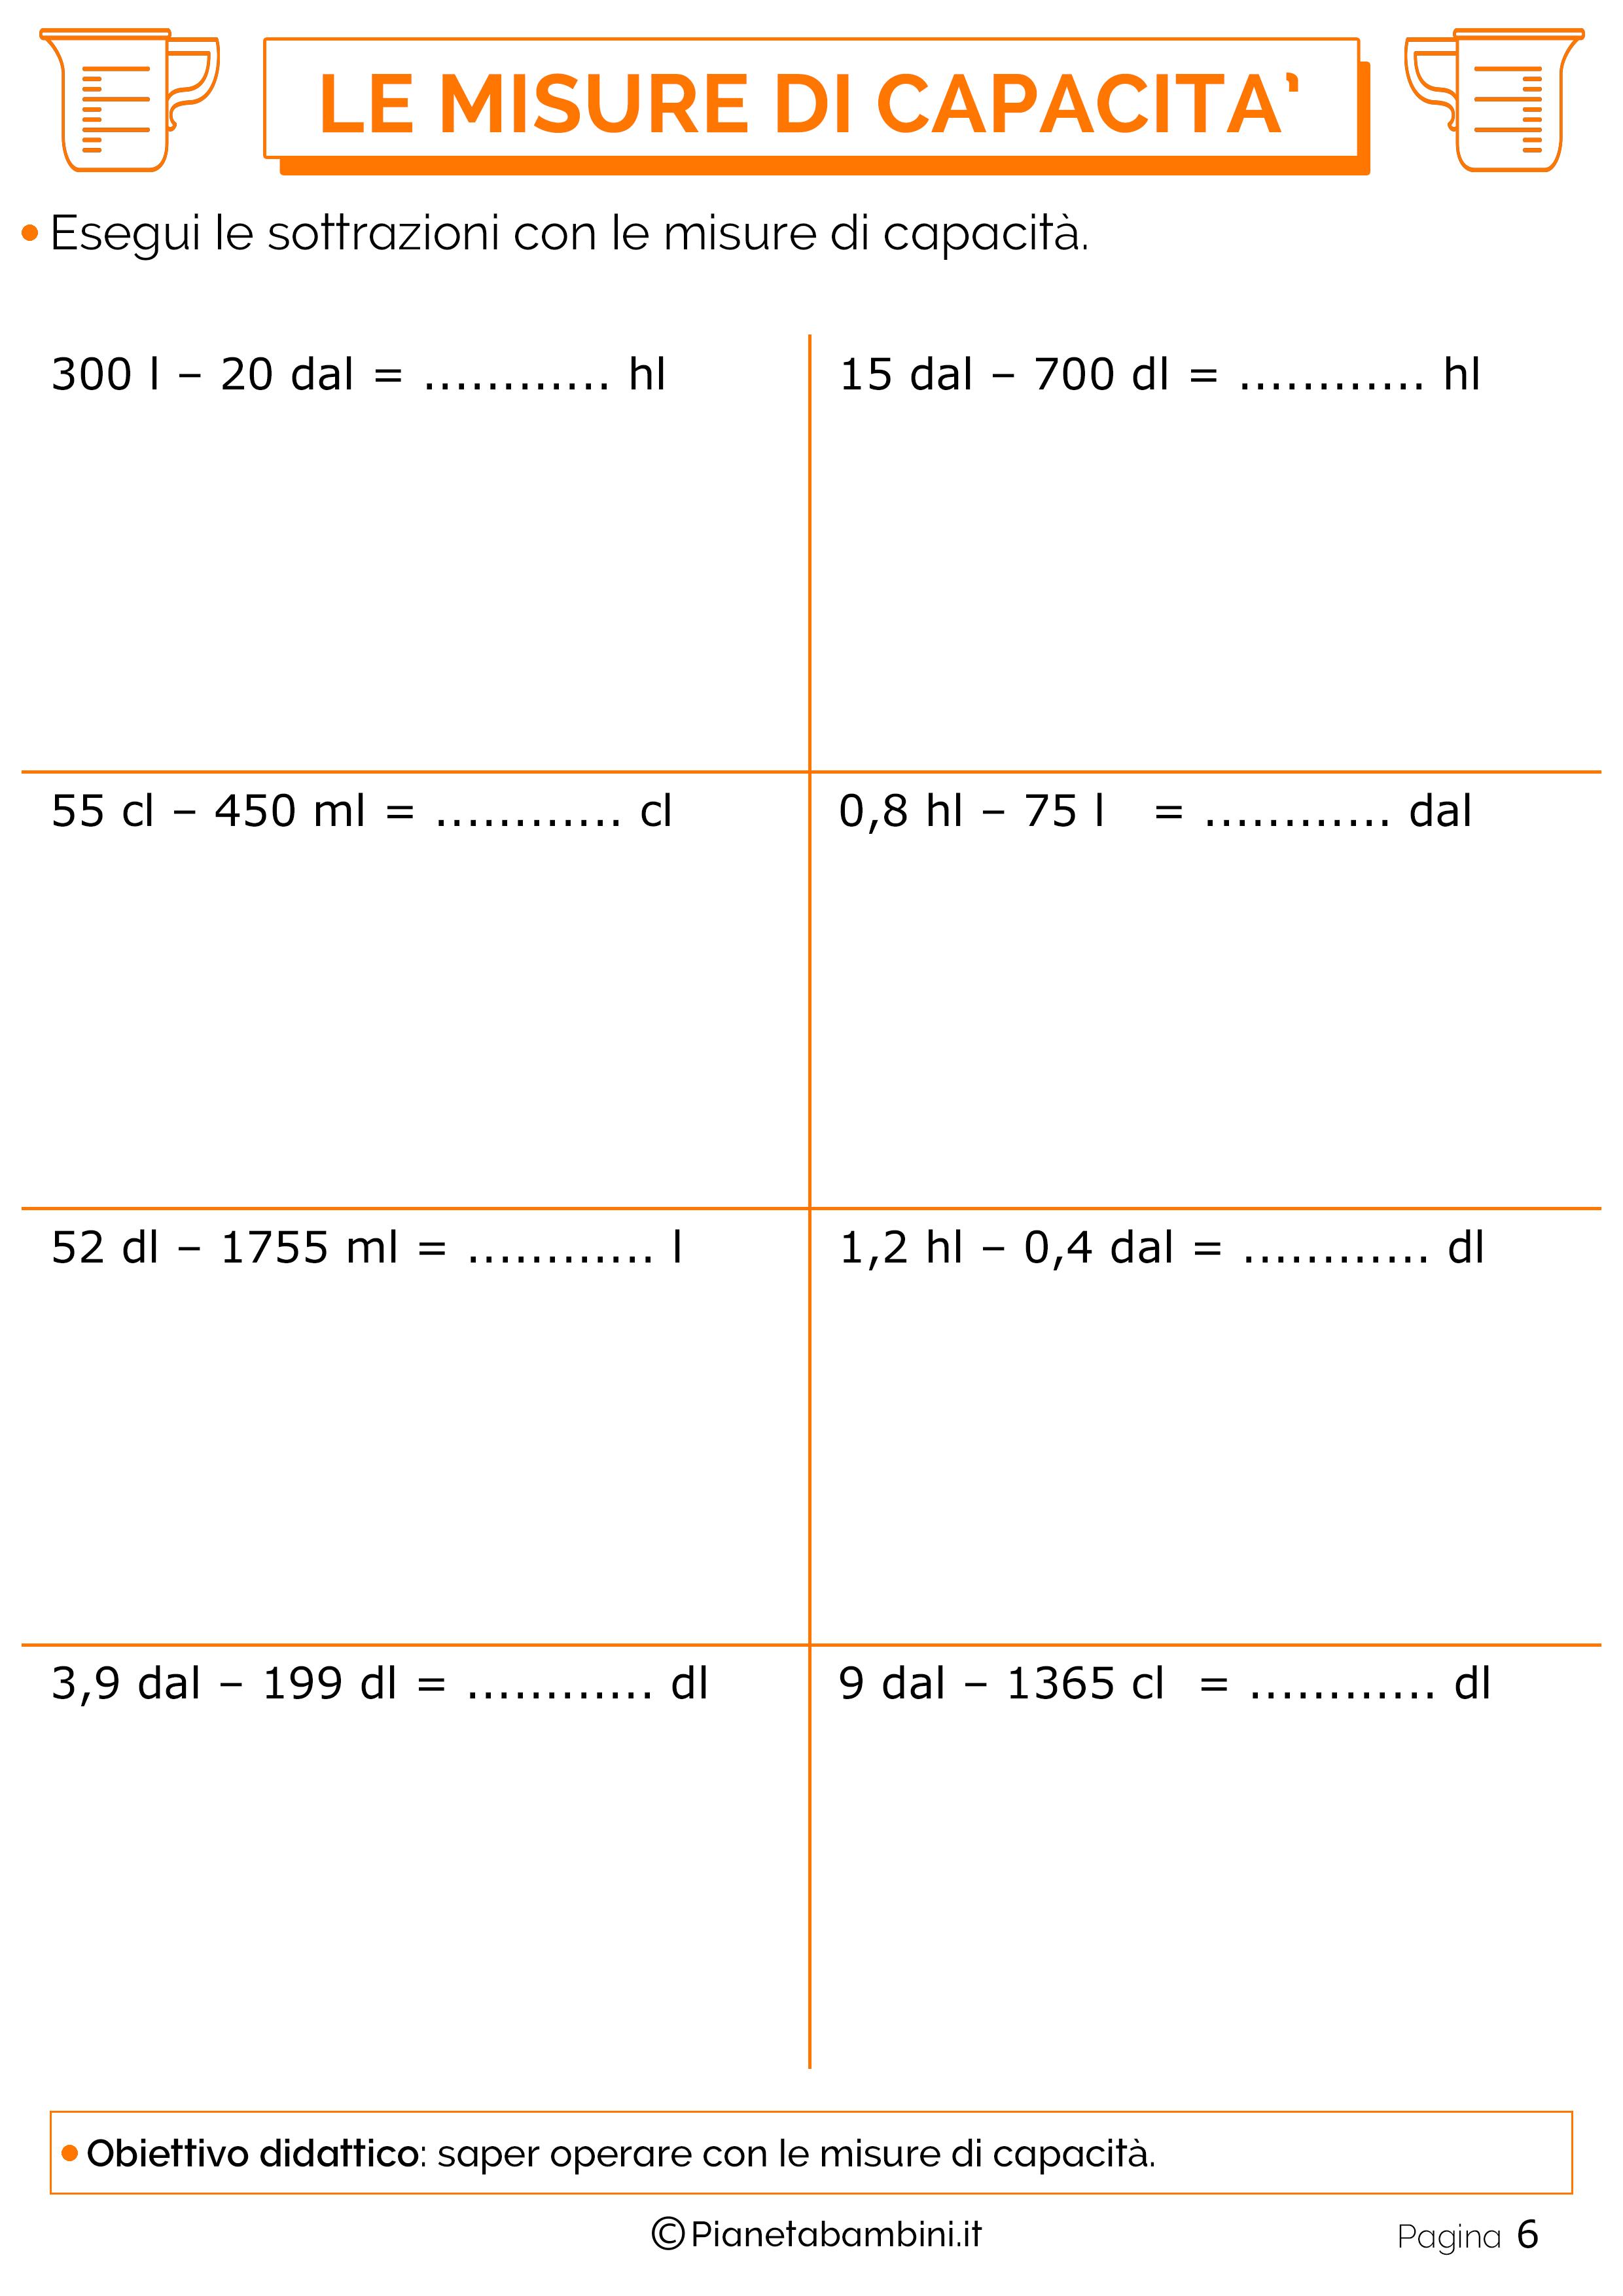 Sottrazioni-Misure-Capacita